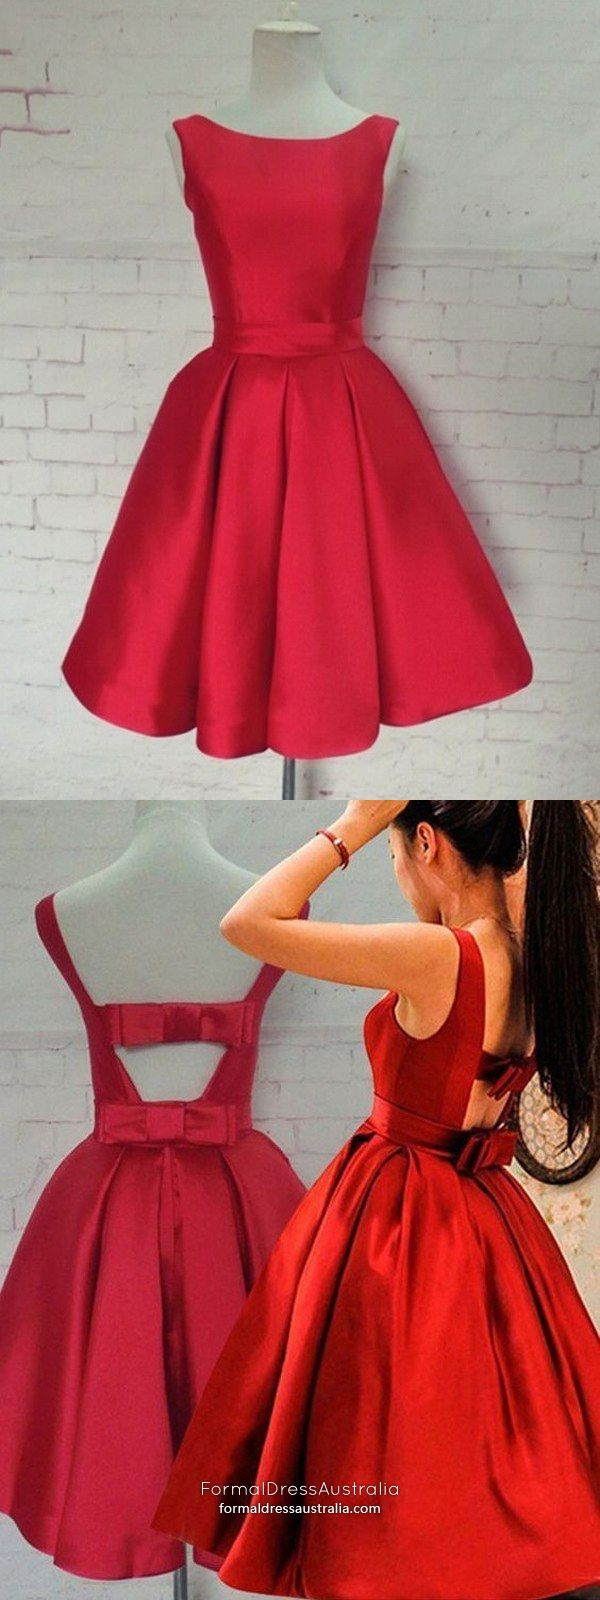 Elegant formal dresses short red prom dresses princess sexy party